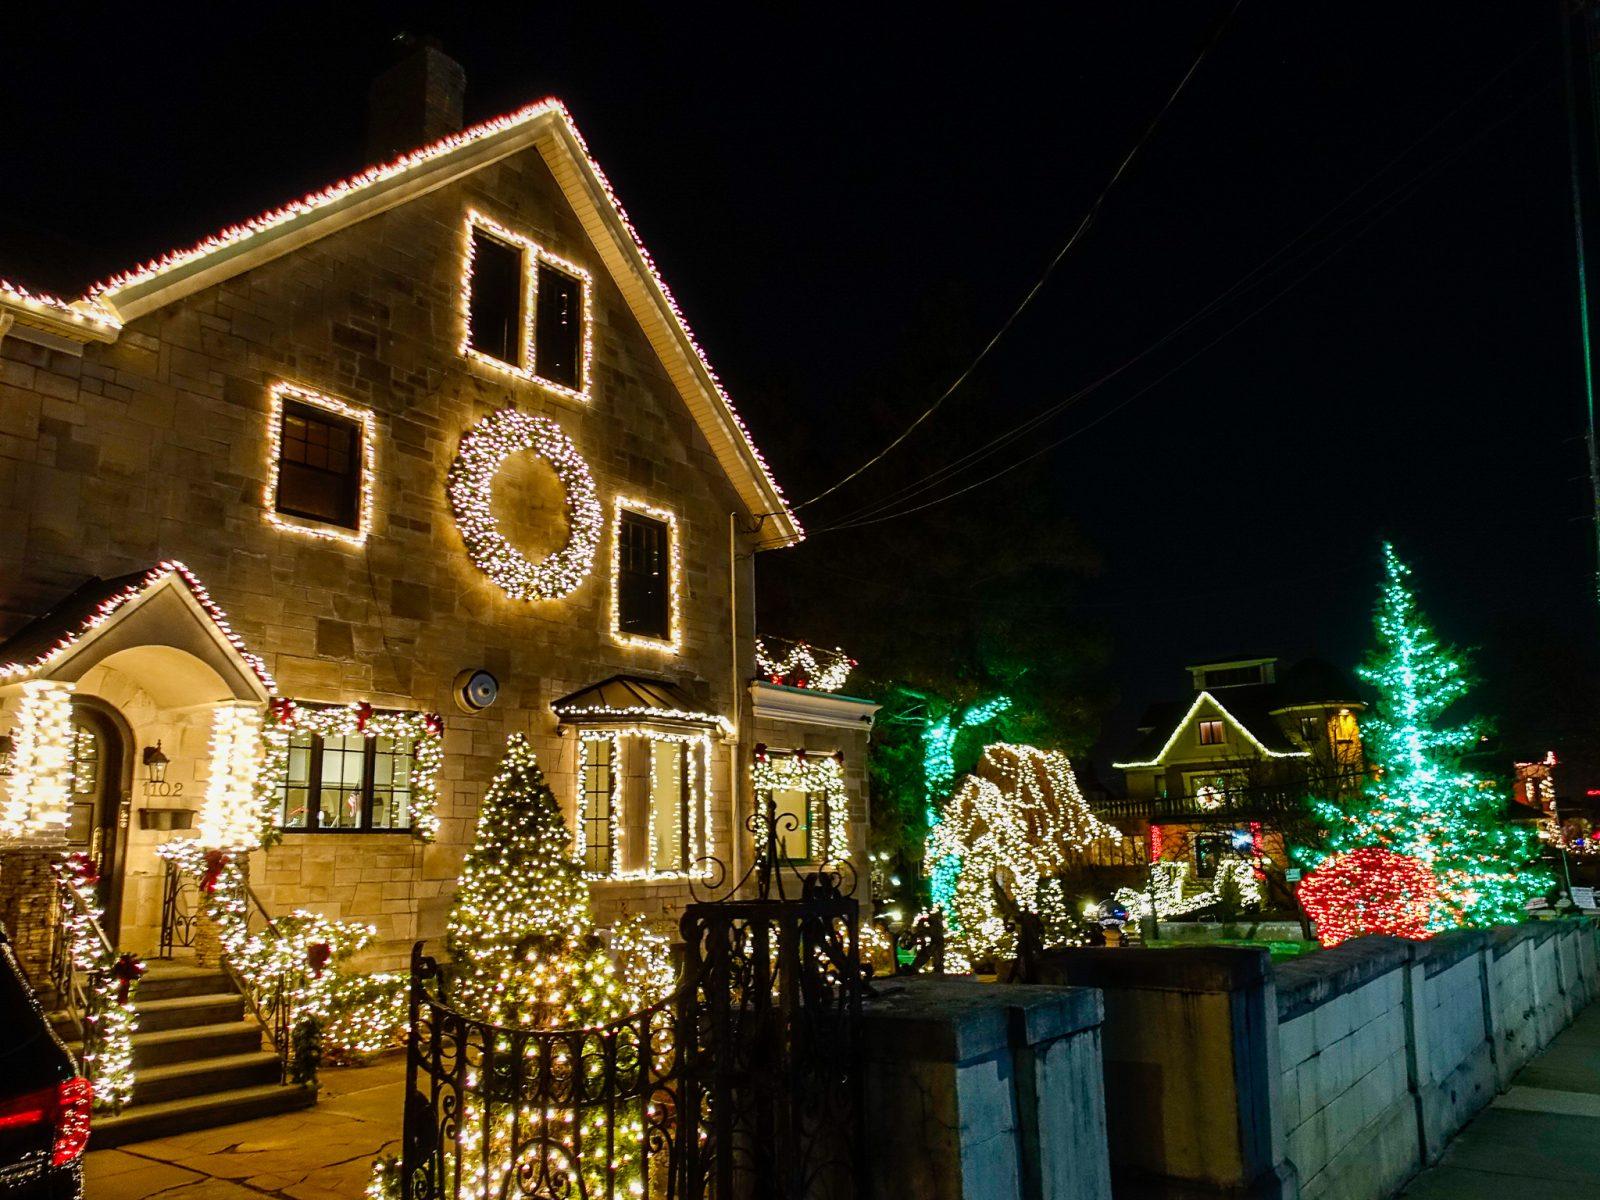 julevandring i julegater